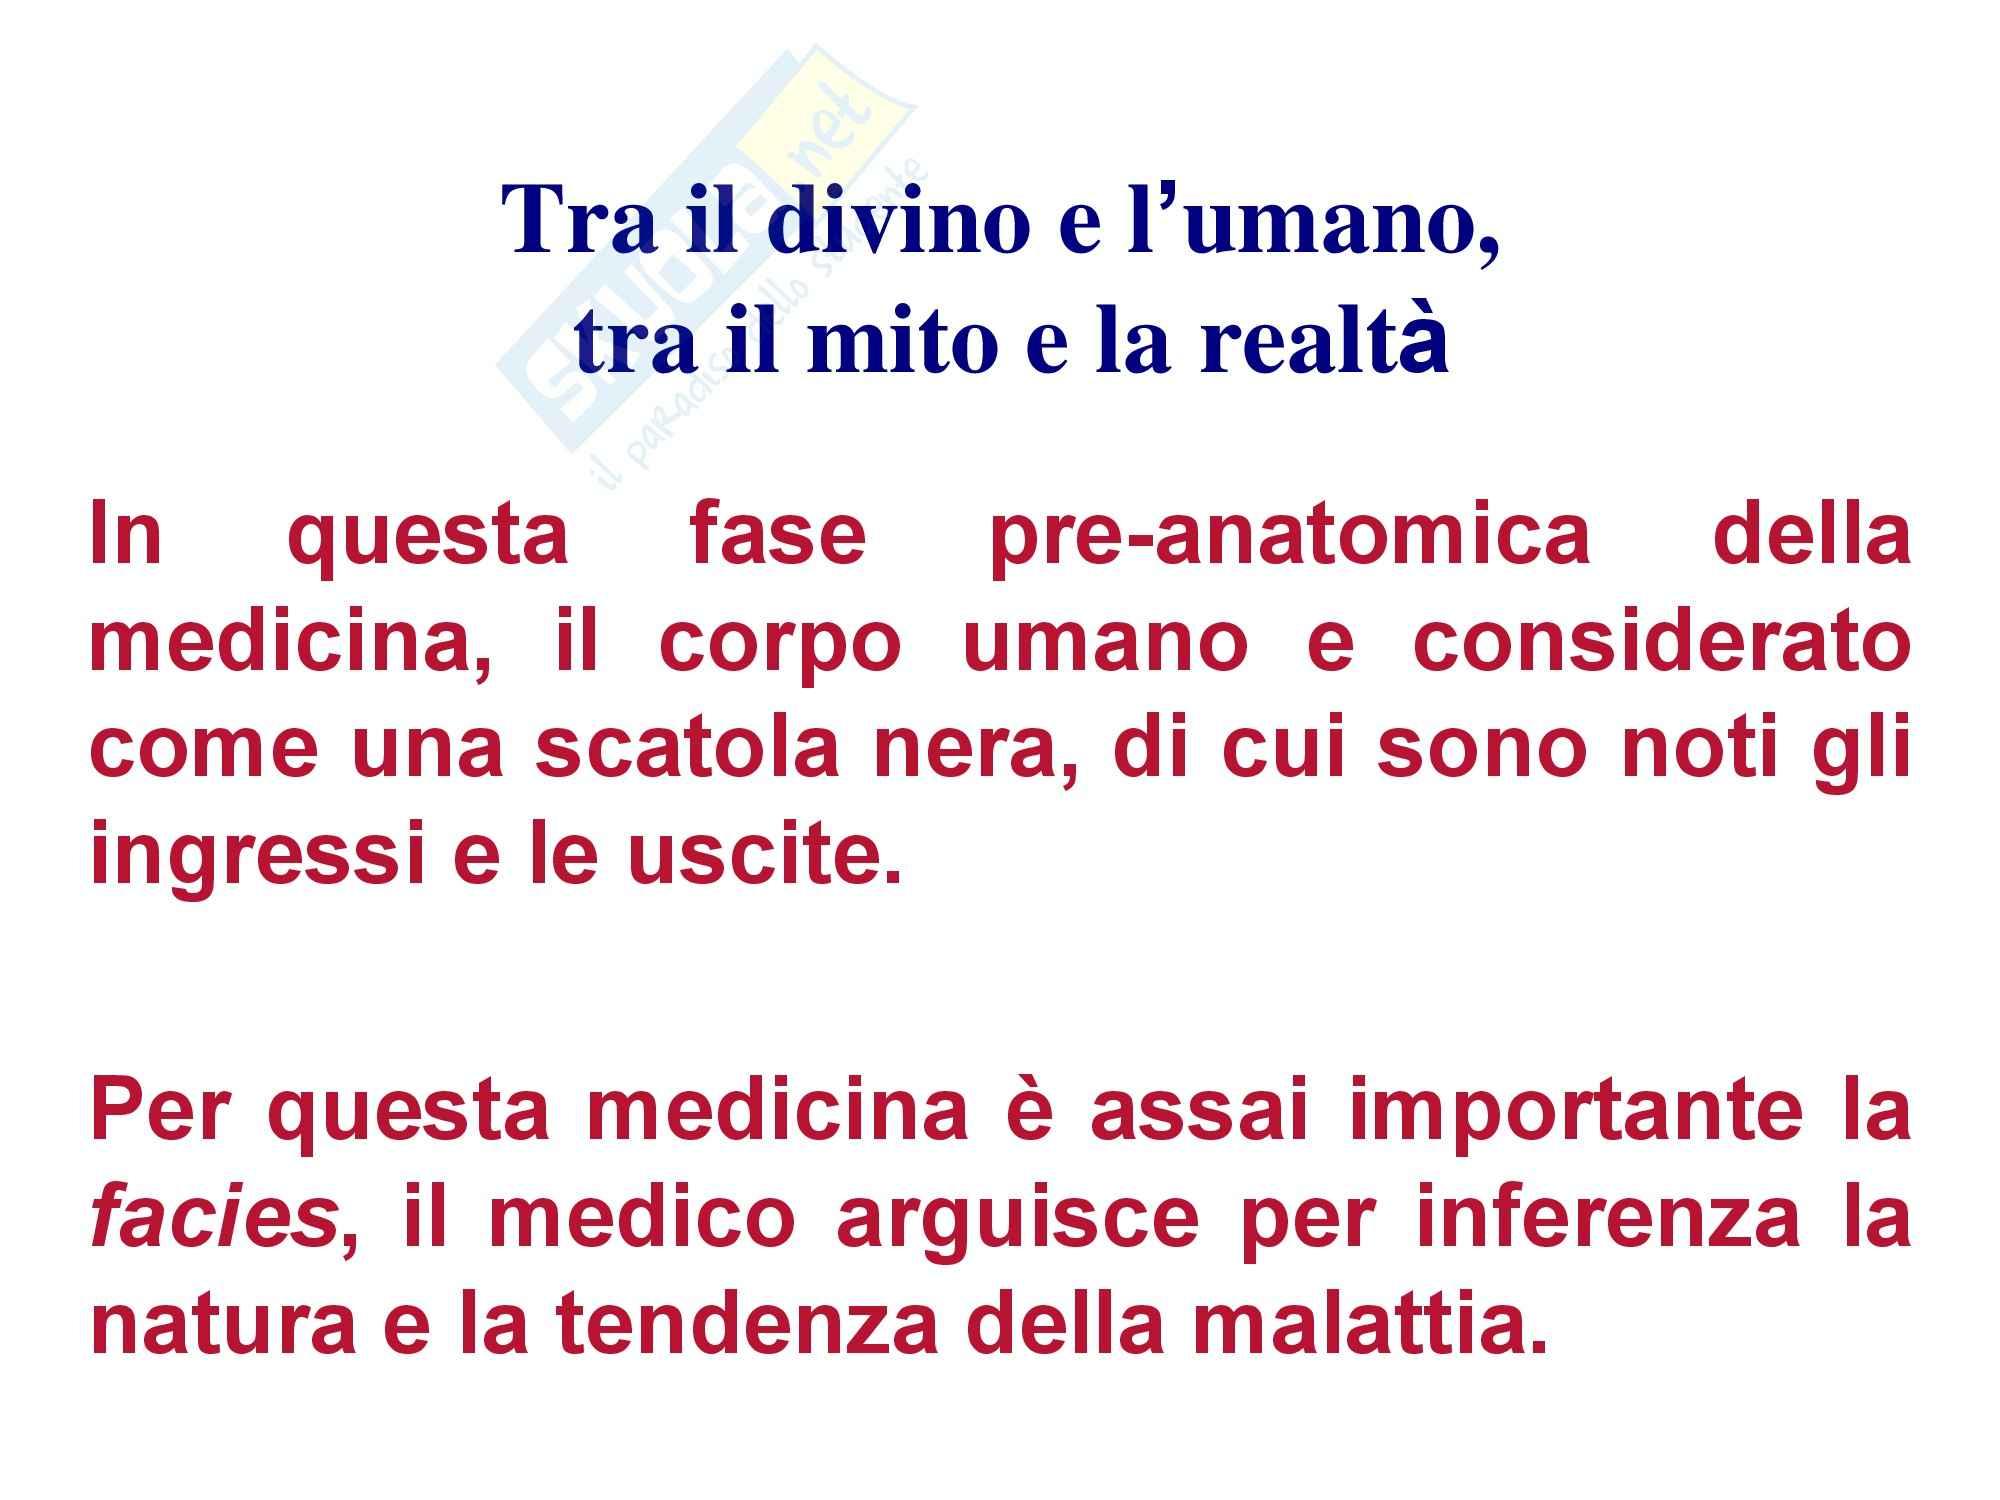 Storia della medicina - Da età classica a moderna Pag. 16